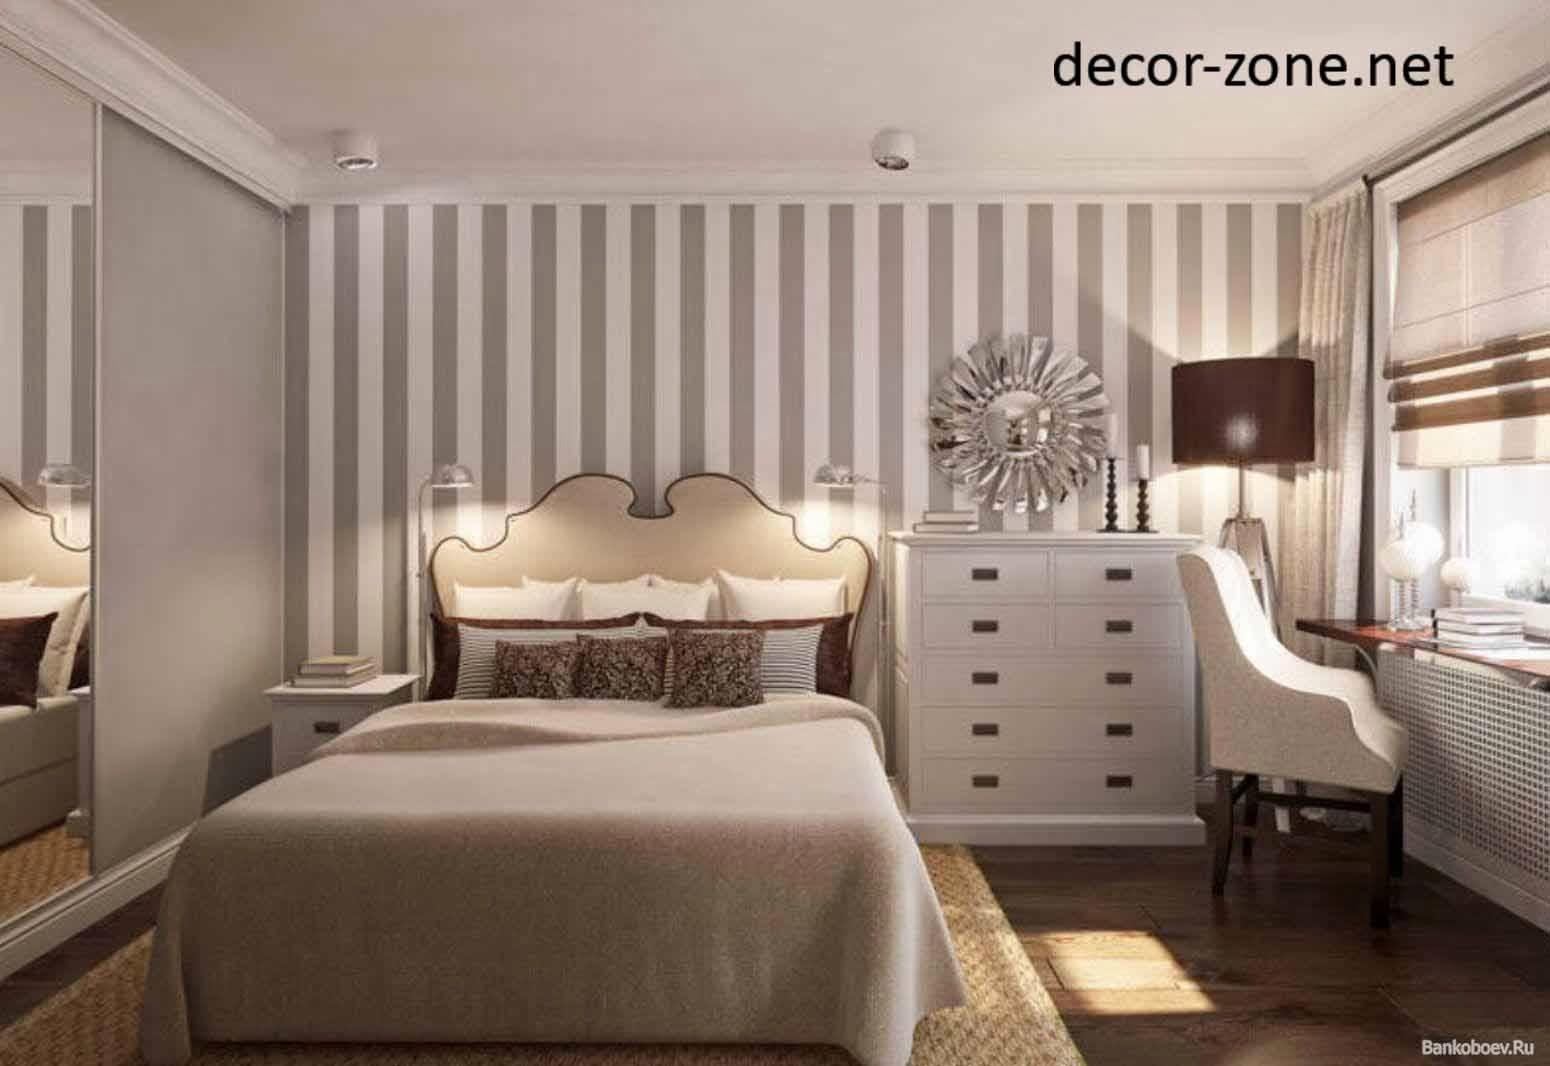 wallpaper for bedroom walls designs,bedroom,furniture,room,bed,interior design